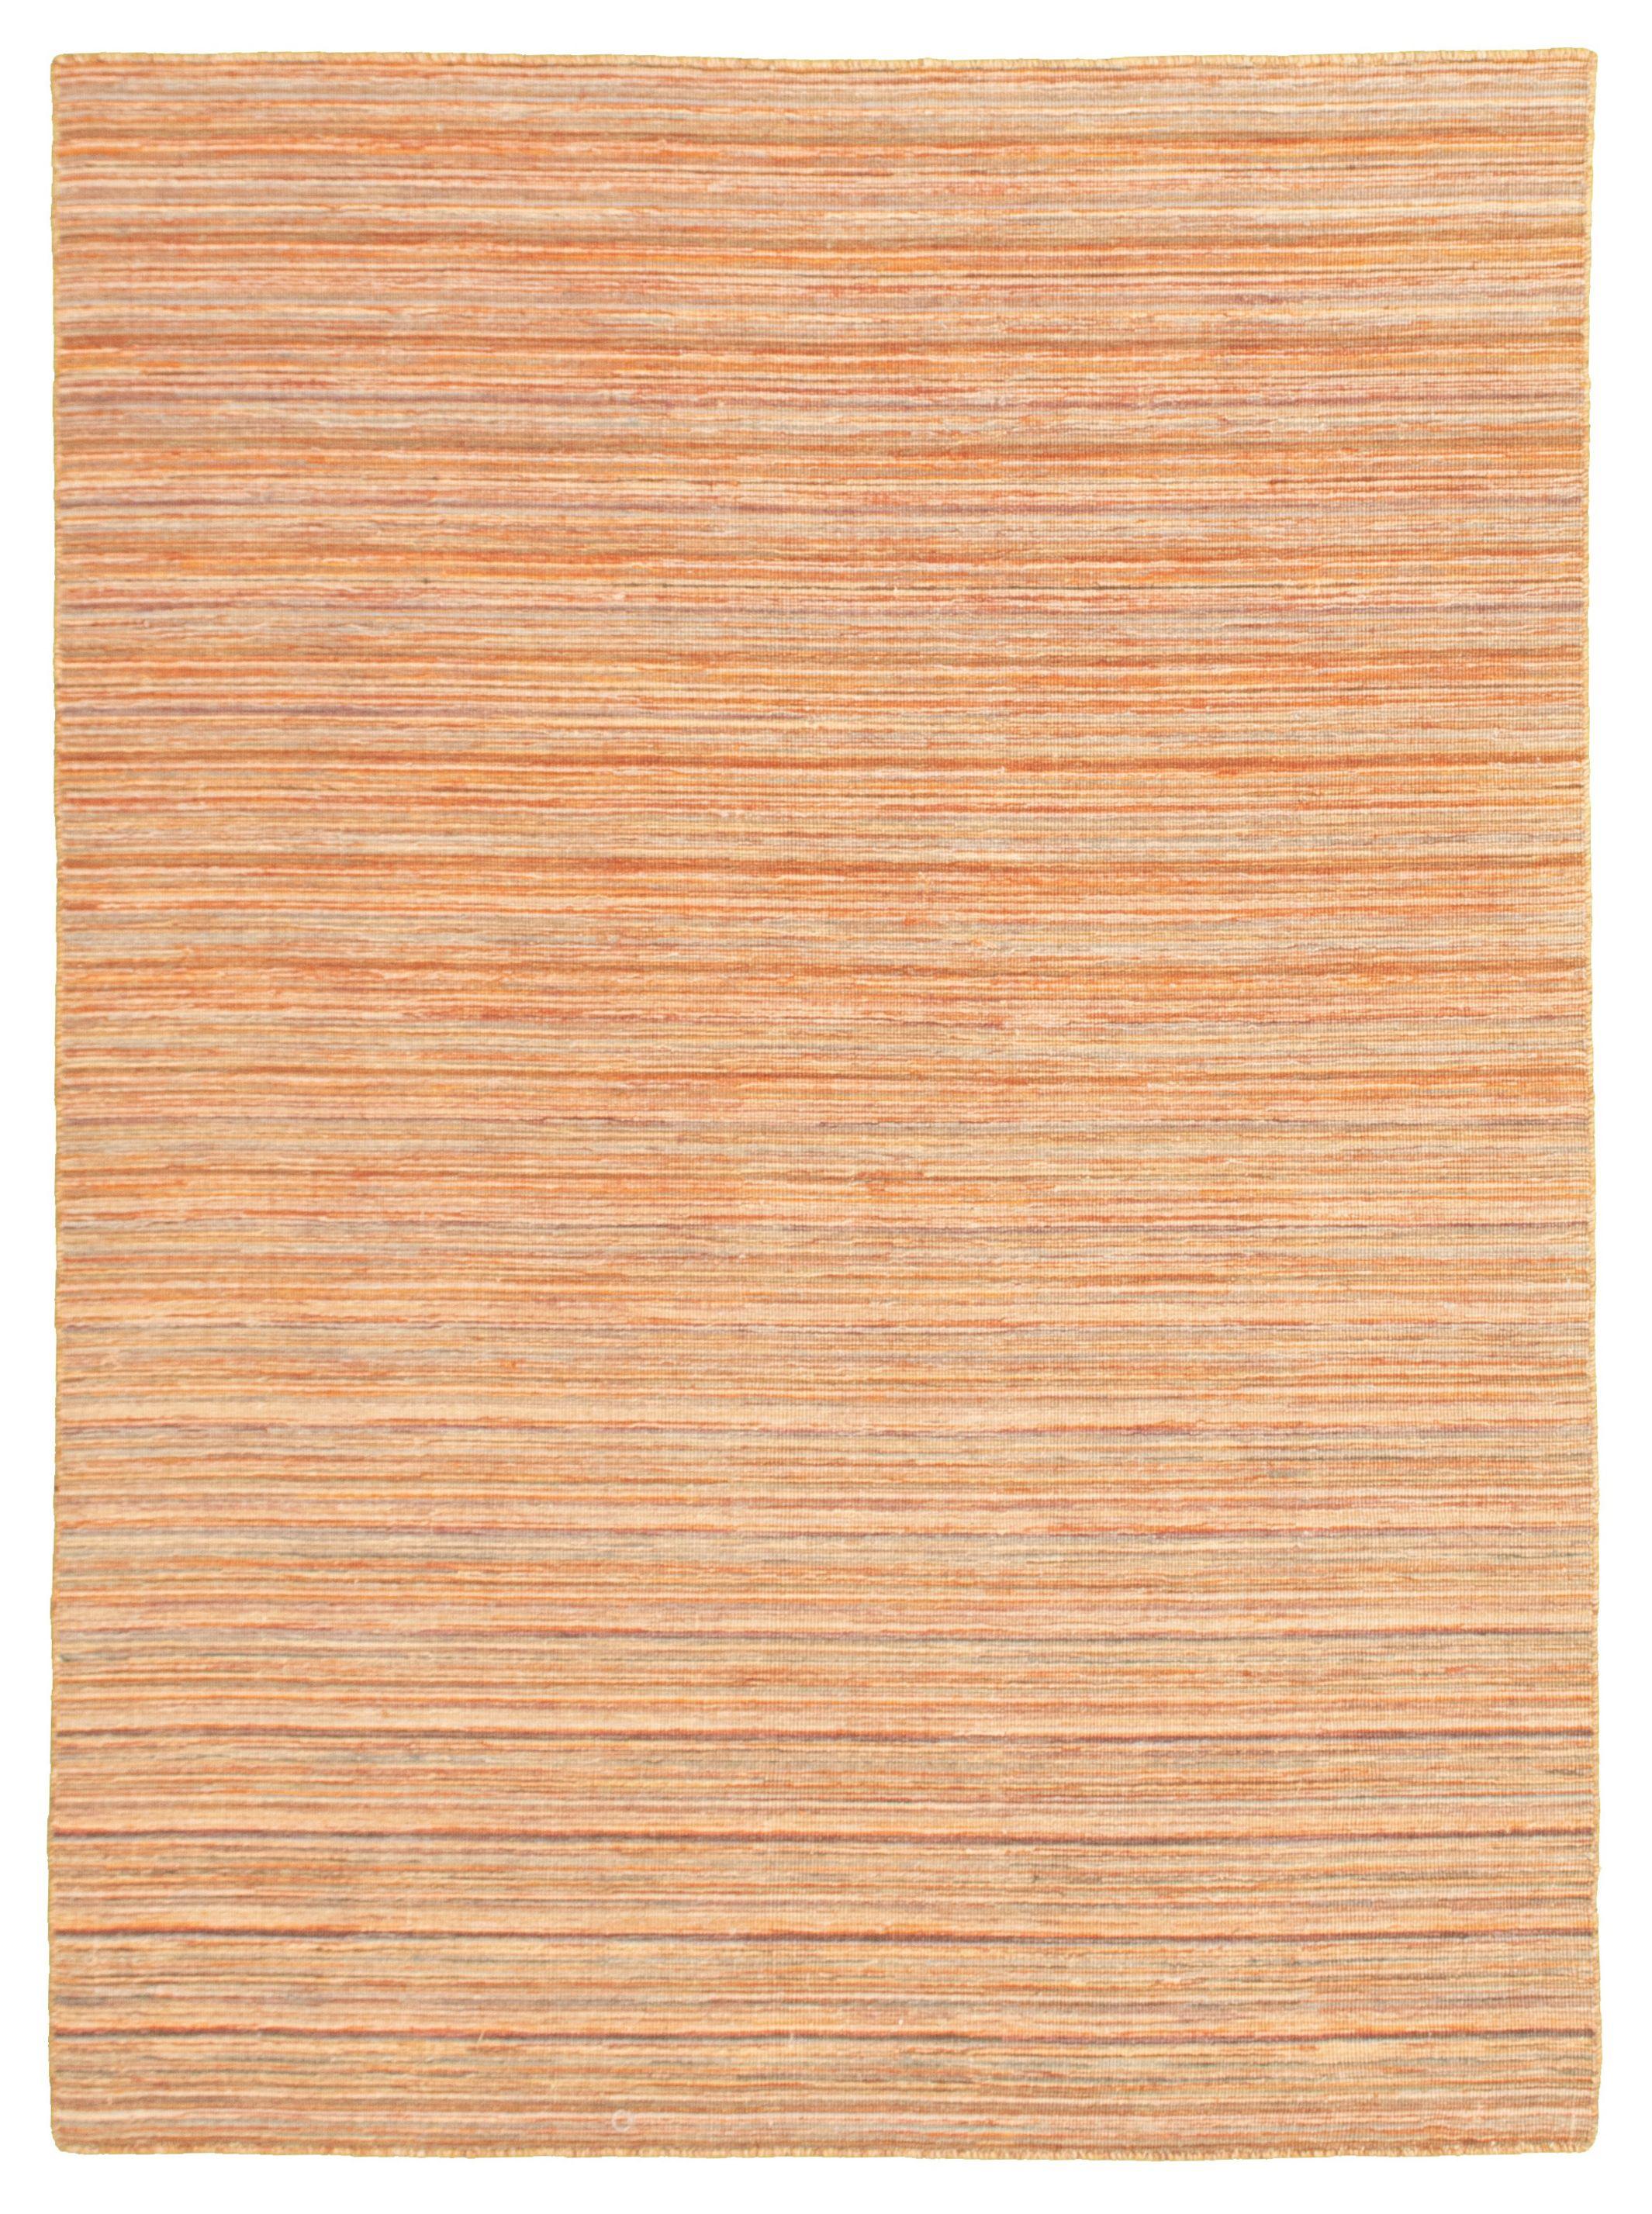 "Hand woven Manhattan Beige Wool Tapestry Kilim 5'0"" x 6'10"" Size: 5'0"" x 6'10"""